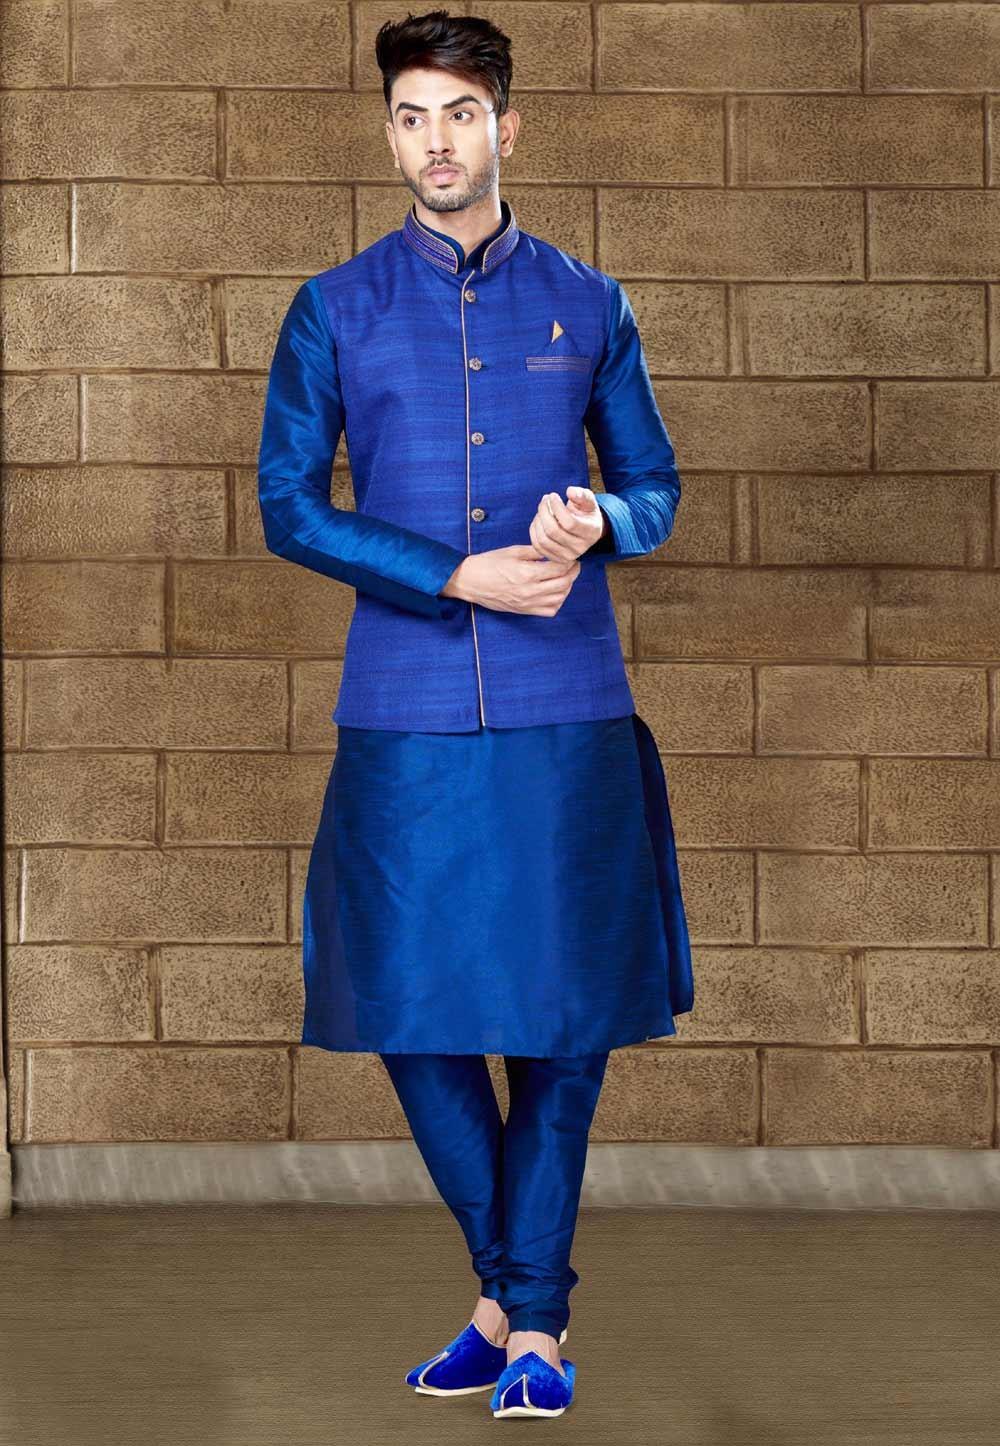 Men's Exquisite Royal Blue Color Kurta Pyjama With Jacket